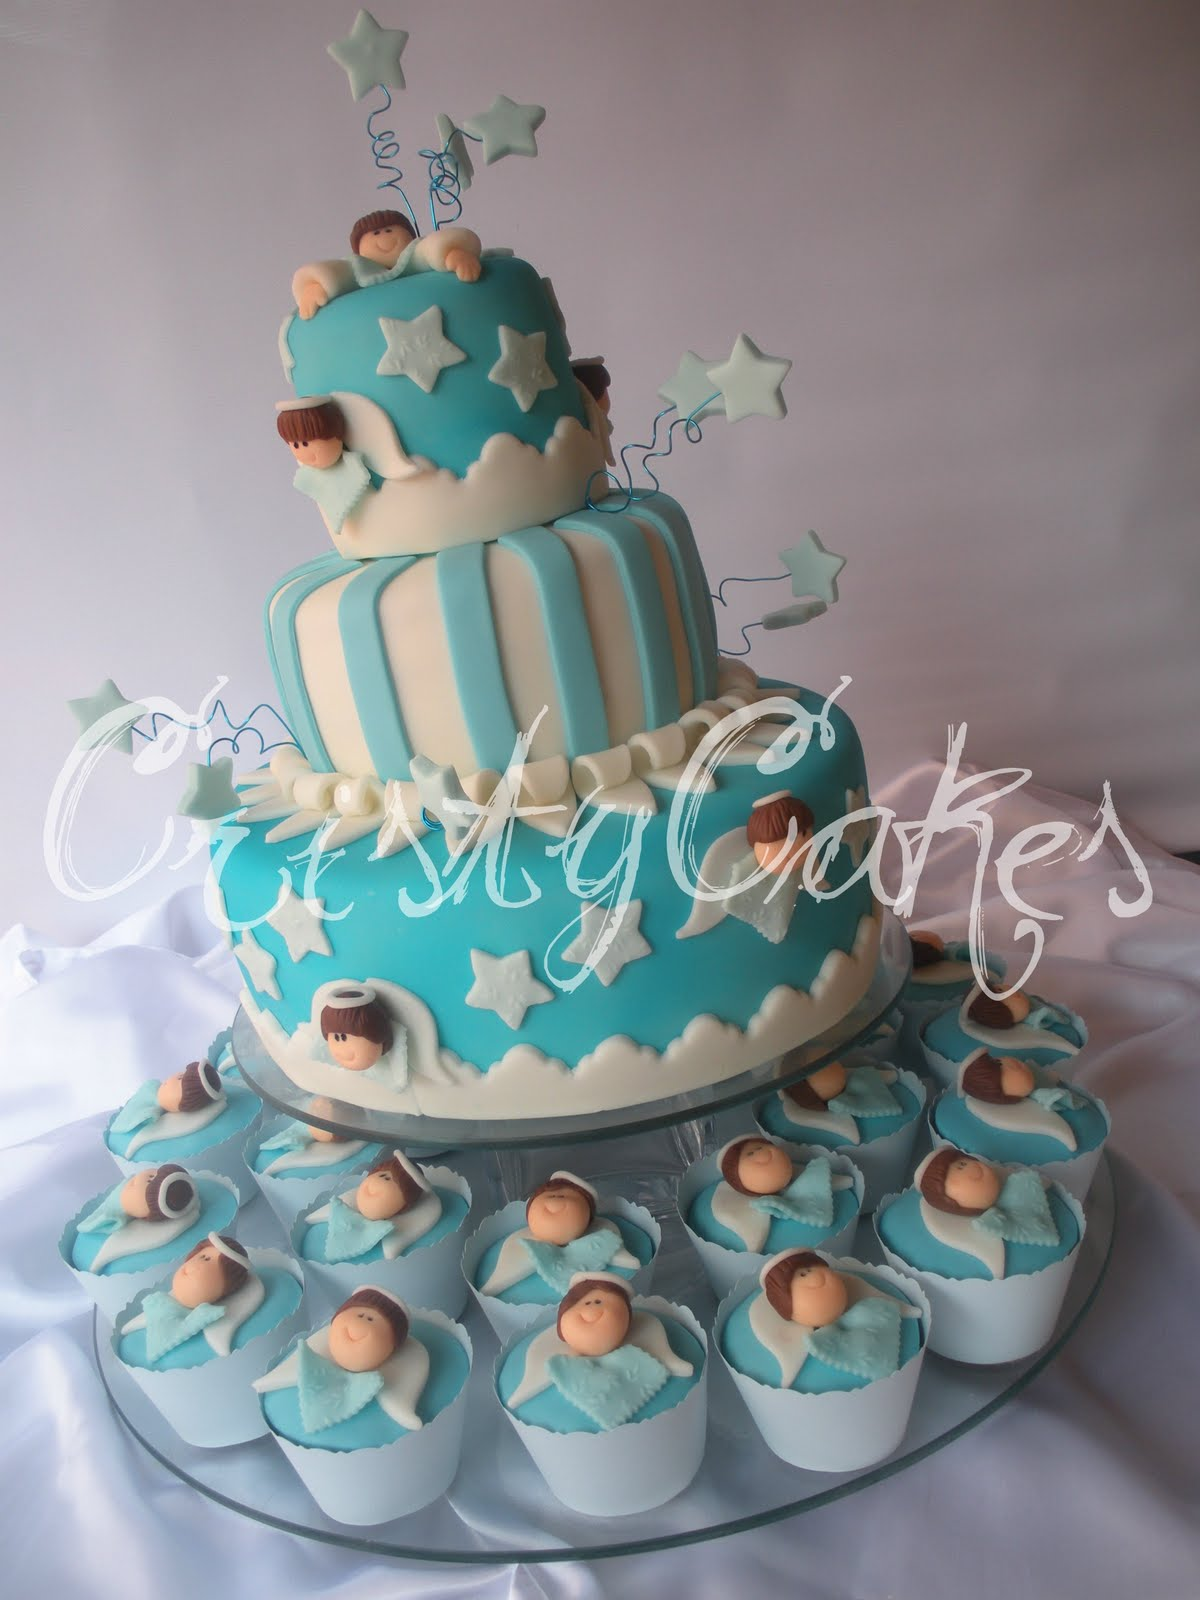 Cristy's Cakes: Baby Shower, Es un varón / It's a Boy